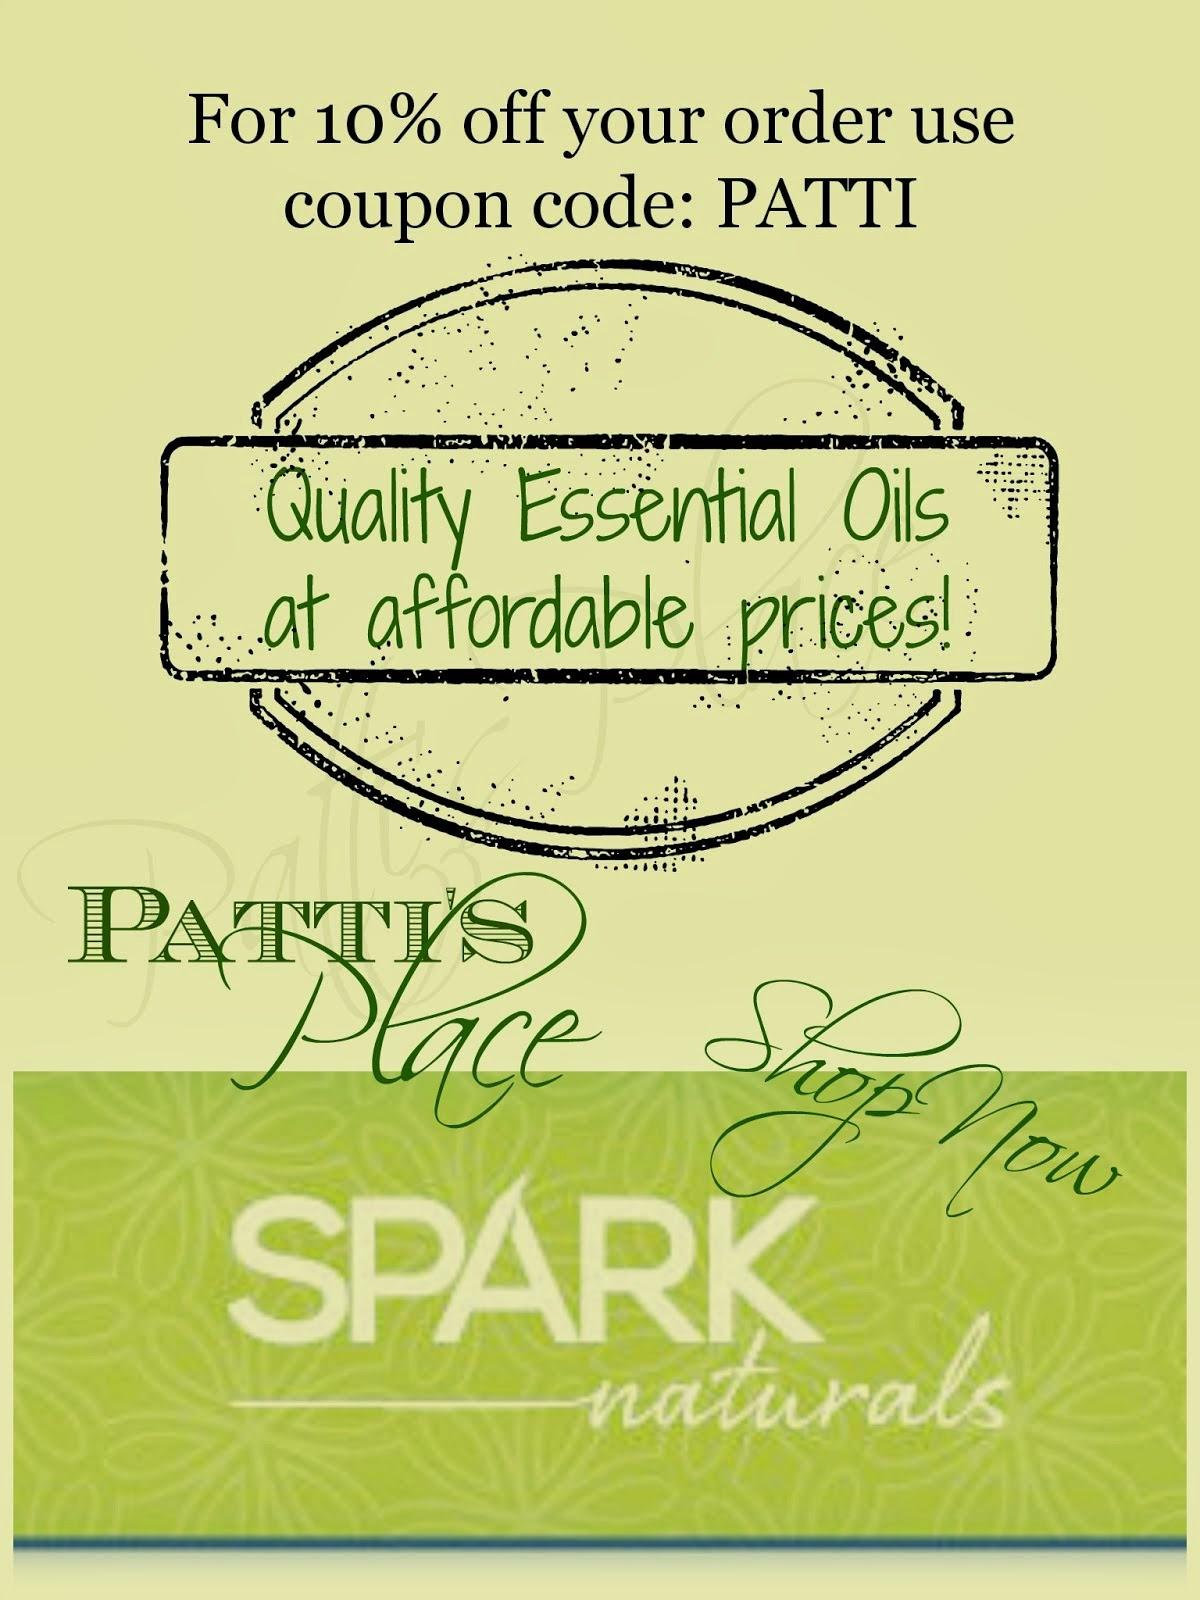 Buy Spark Naturals Oils!